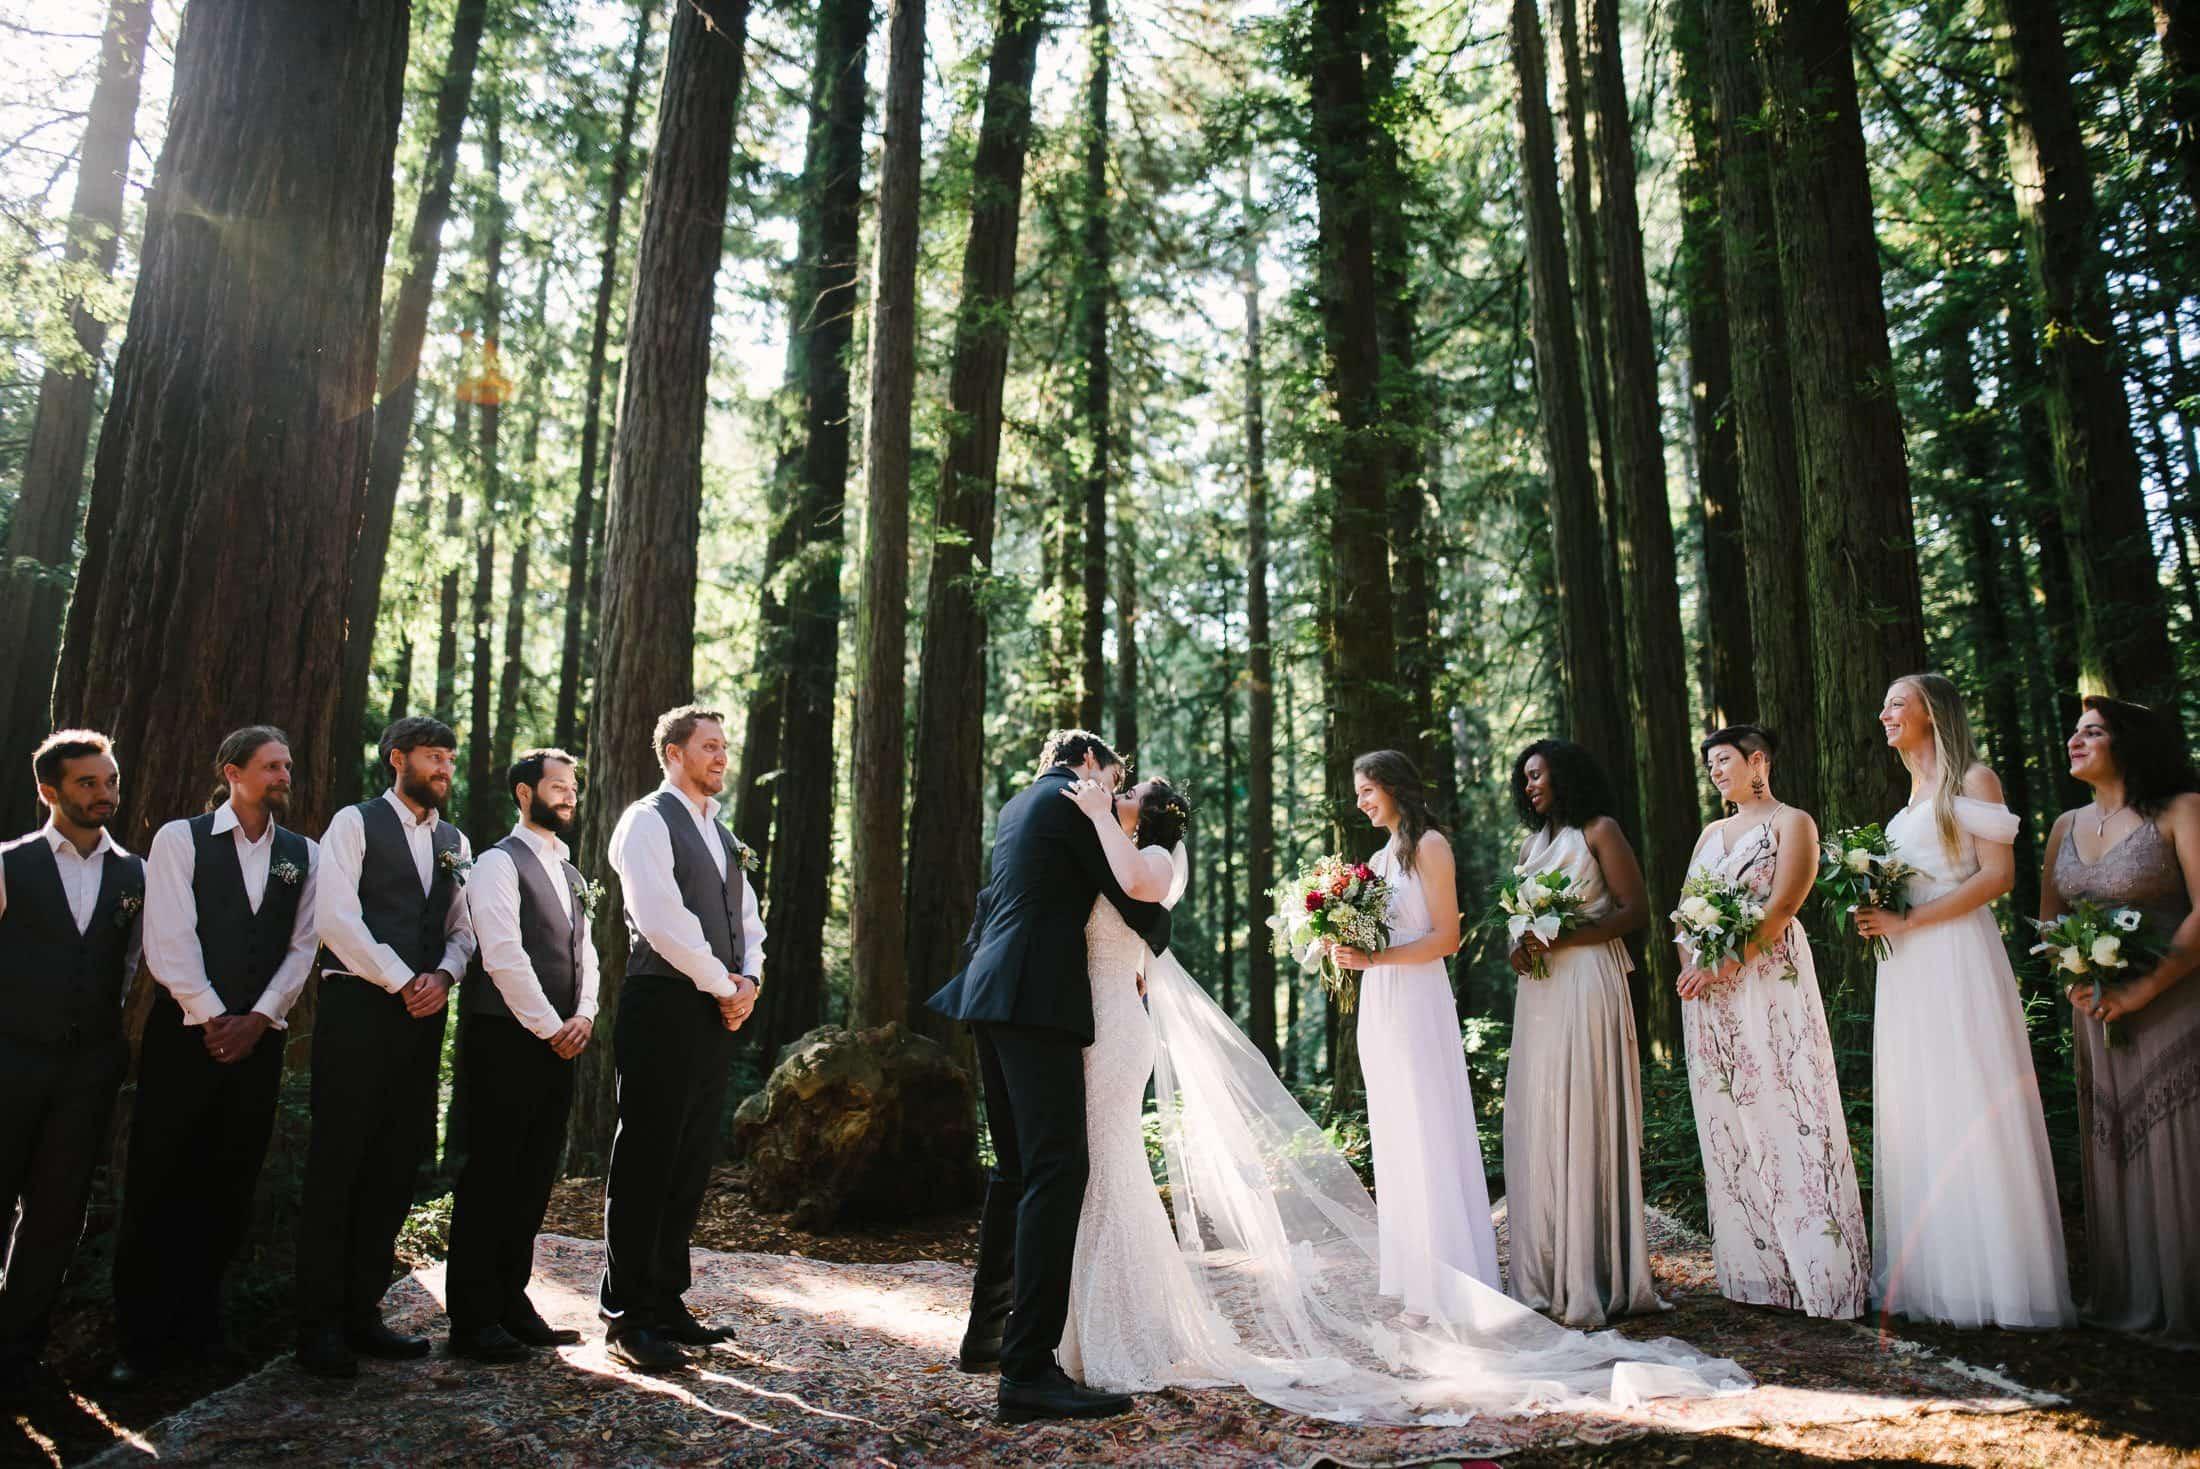 Robert's Regional Park wedding ceremony Kiss